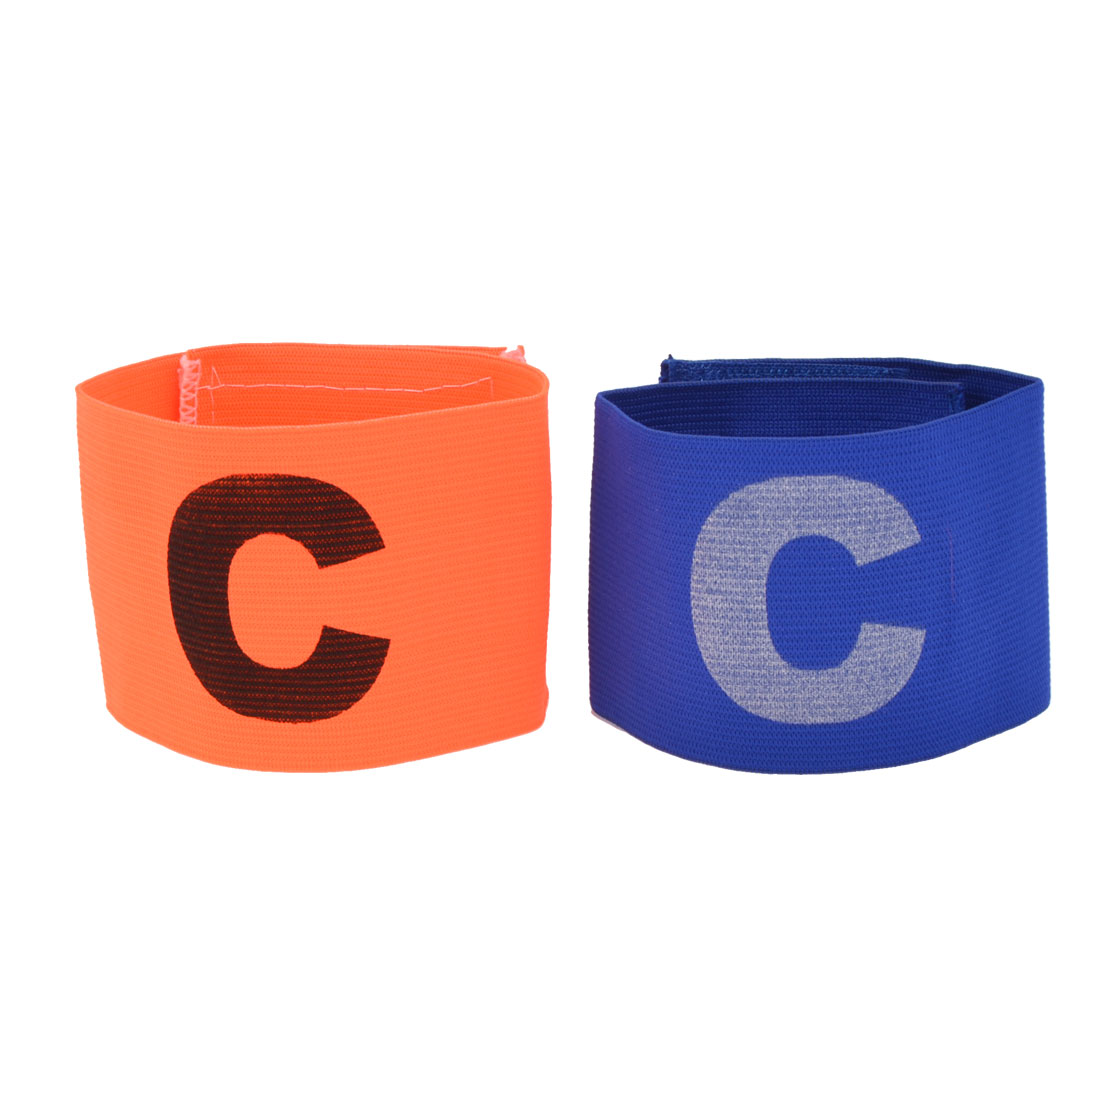 Hook Loop Closure Orange Blue Stretchy Football Captain Armband Badge 2 PCS